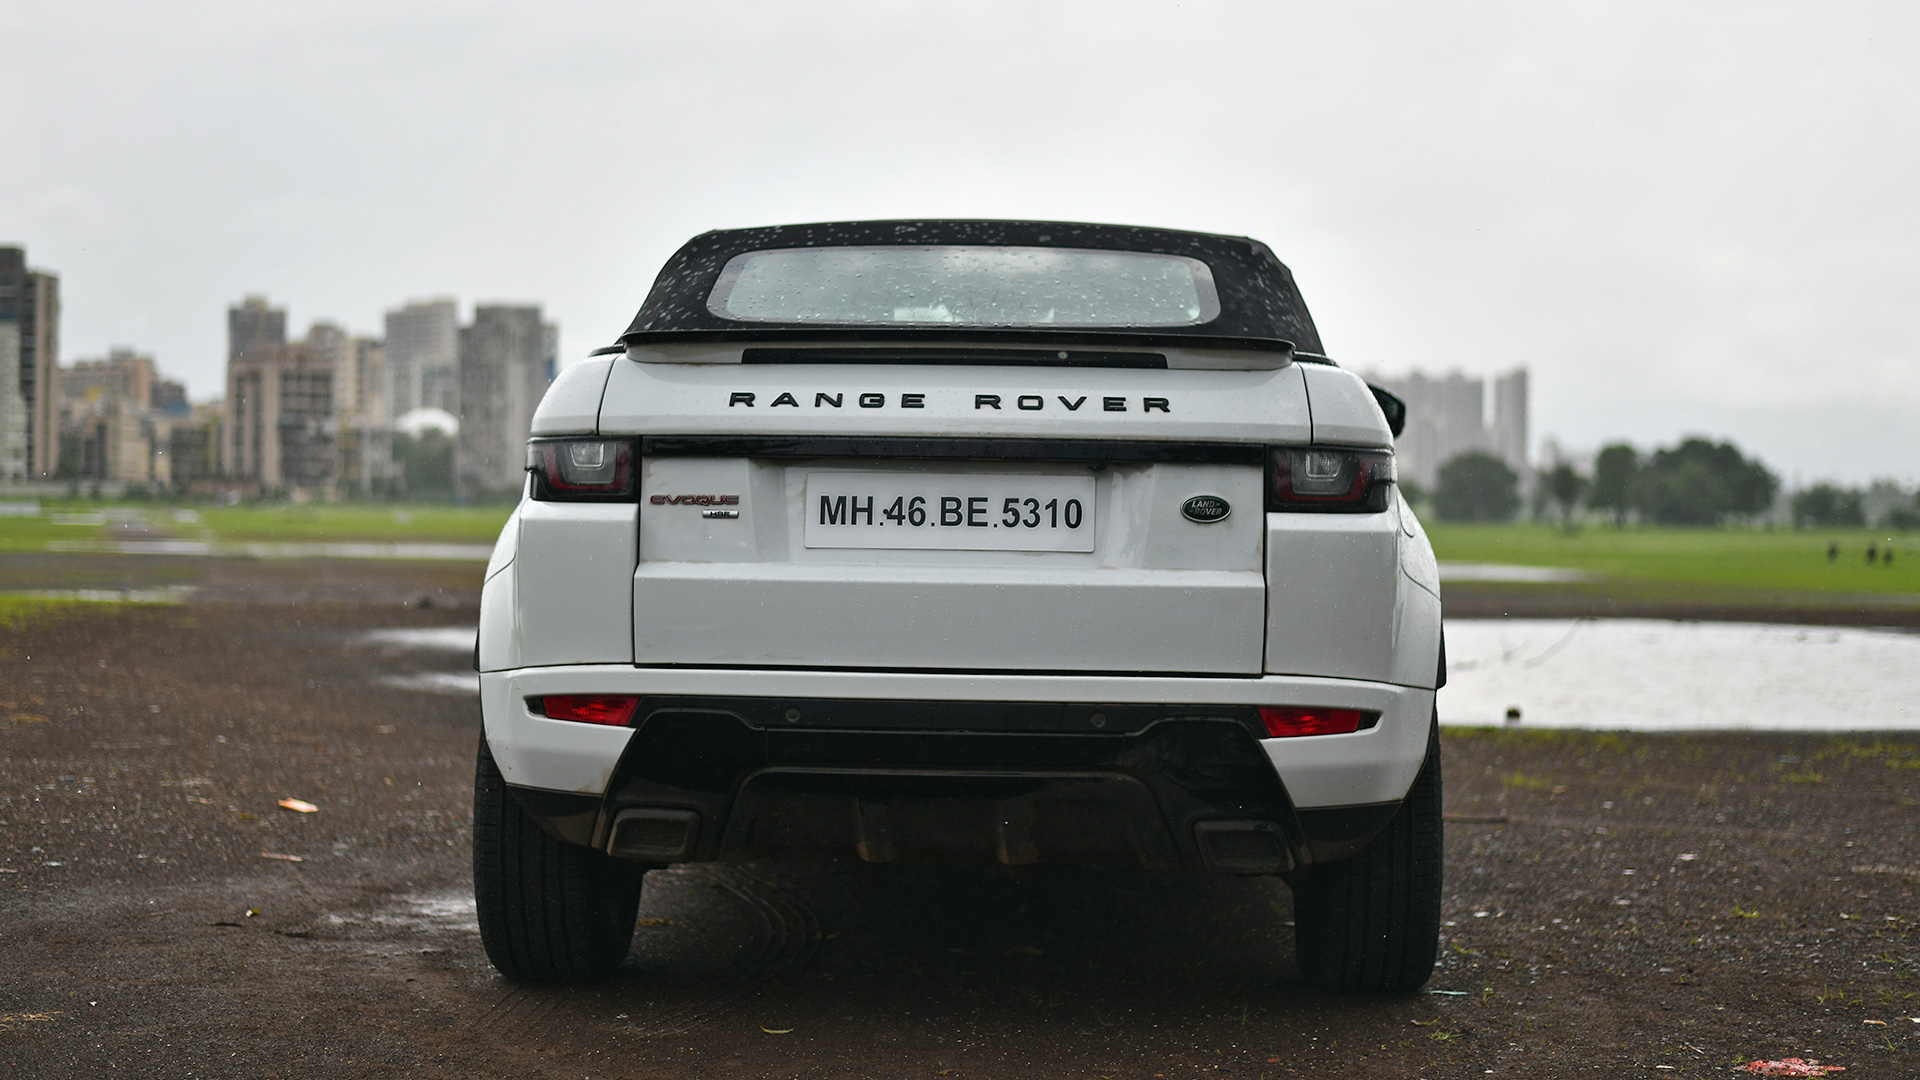 Land Rover Range Rover Evoque Convertible 2018 HSE Dynamic Petrol